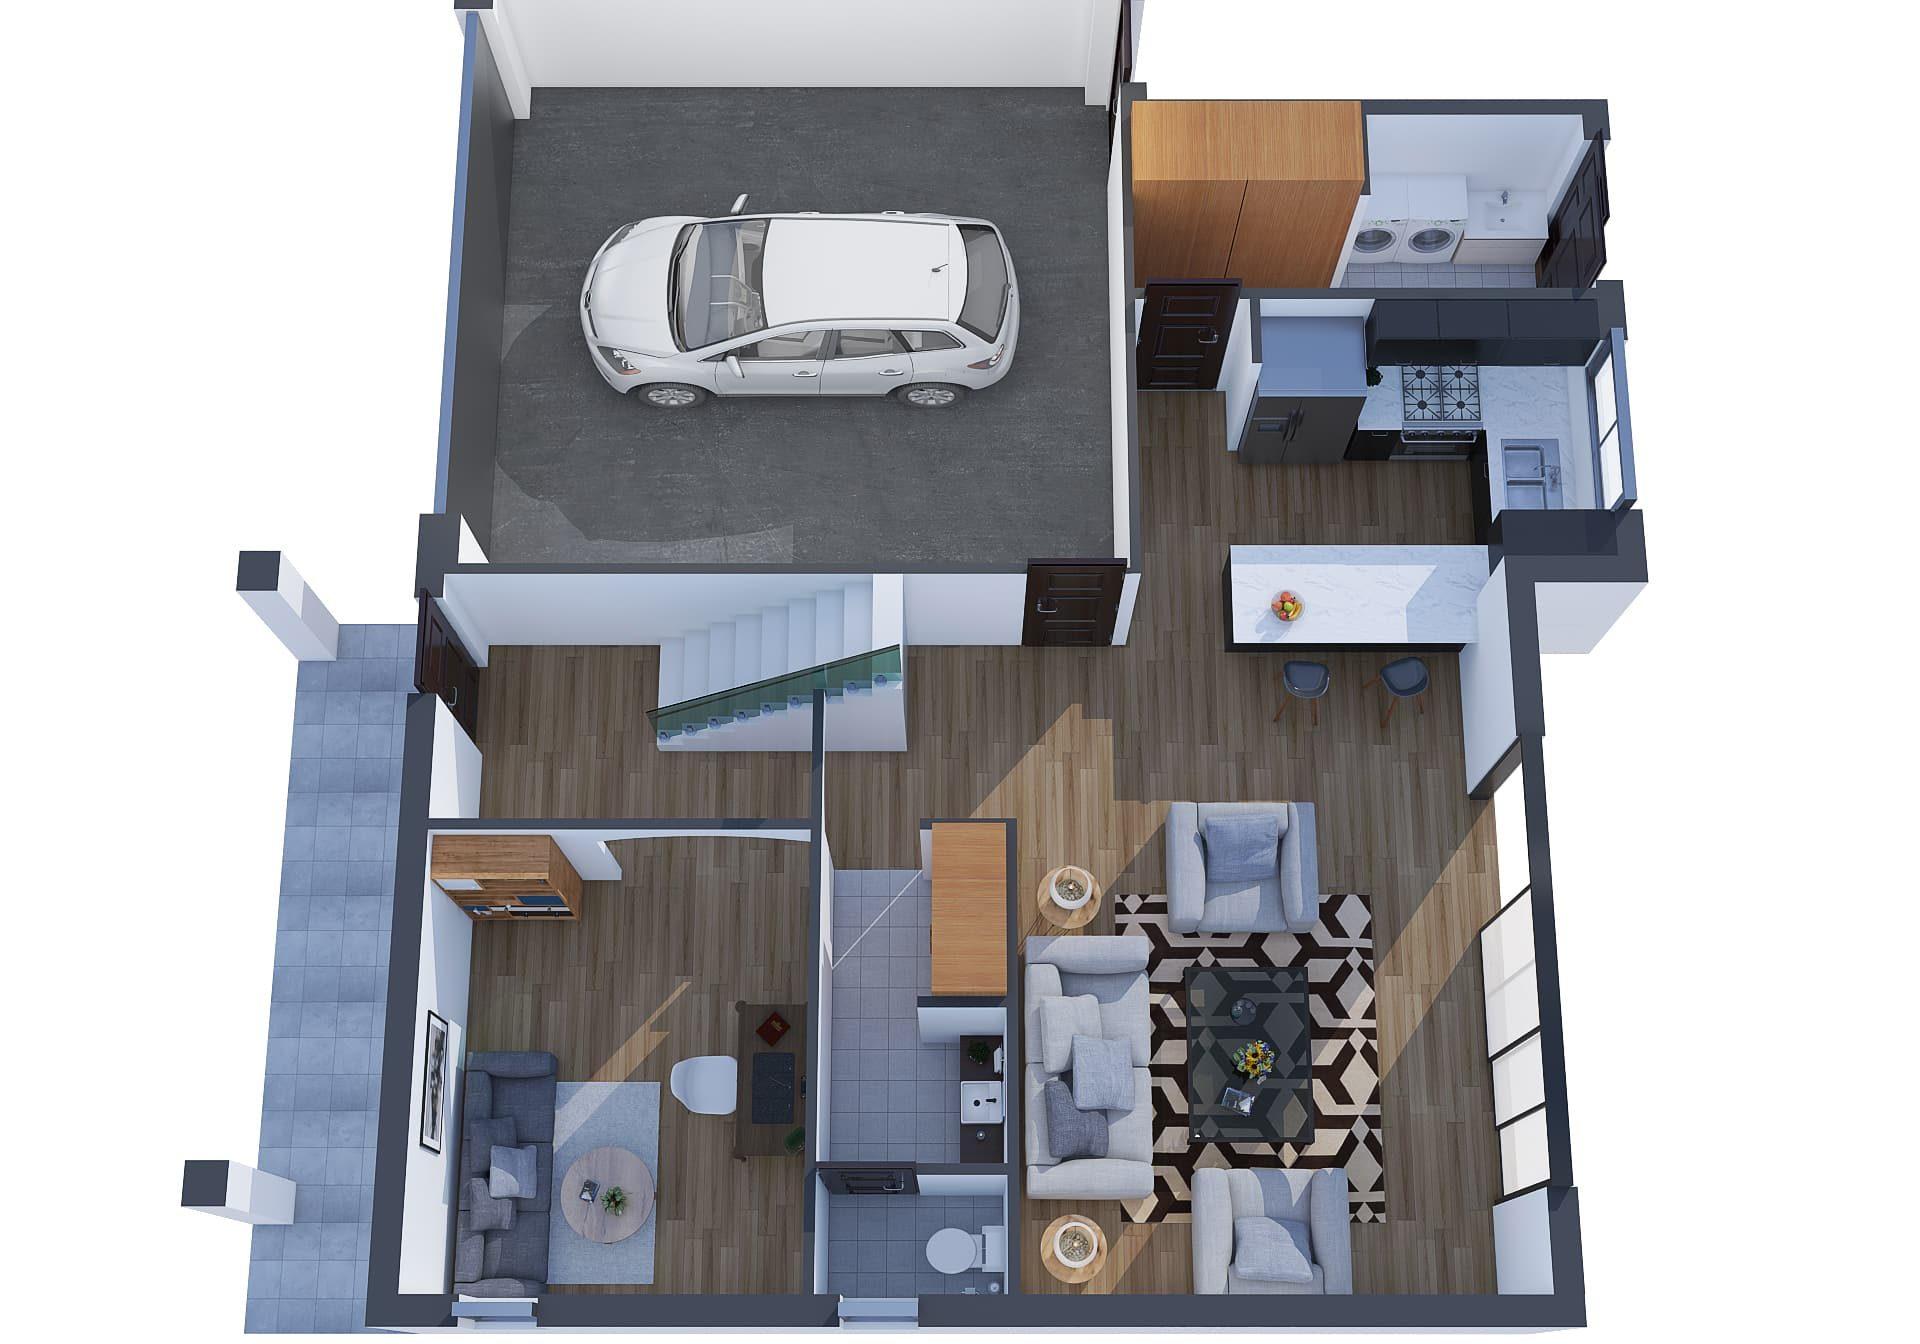 9560-FloorplanFirstFloor-1 (1)